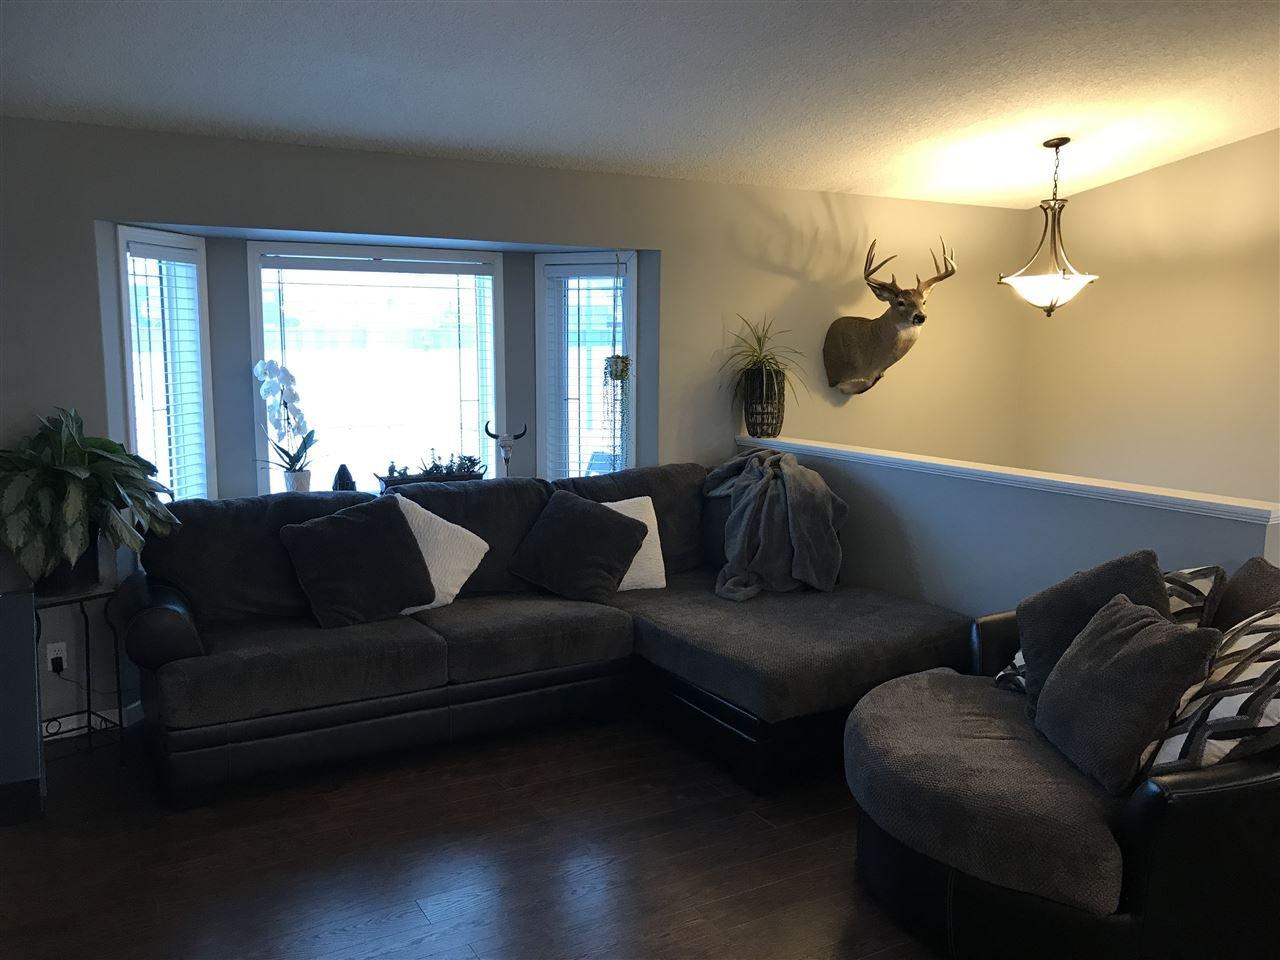 "Photo 6: Photos: 8724 114 Avenue in Fort St. John: Fort St. John - City NE House for sale in ""PANORAMA RIDGE"" (Fort St. John (Zone 60))  : MLS®# R2428633"